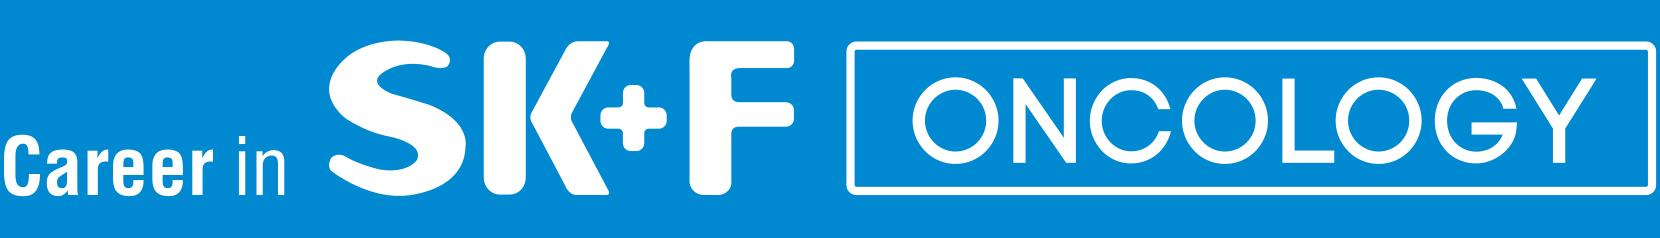 CAREER IN SKF - এসকেএফ ফার্মাসিউটিক্যালস কোম্পানির চাকরির খবর